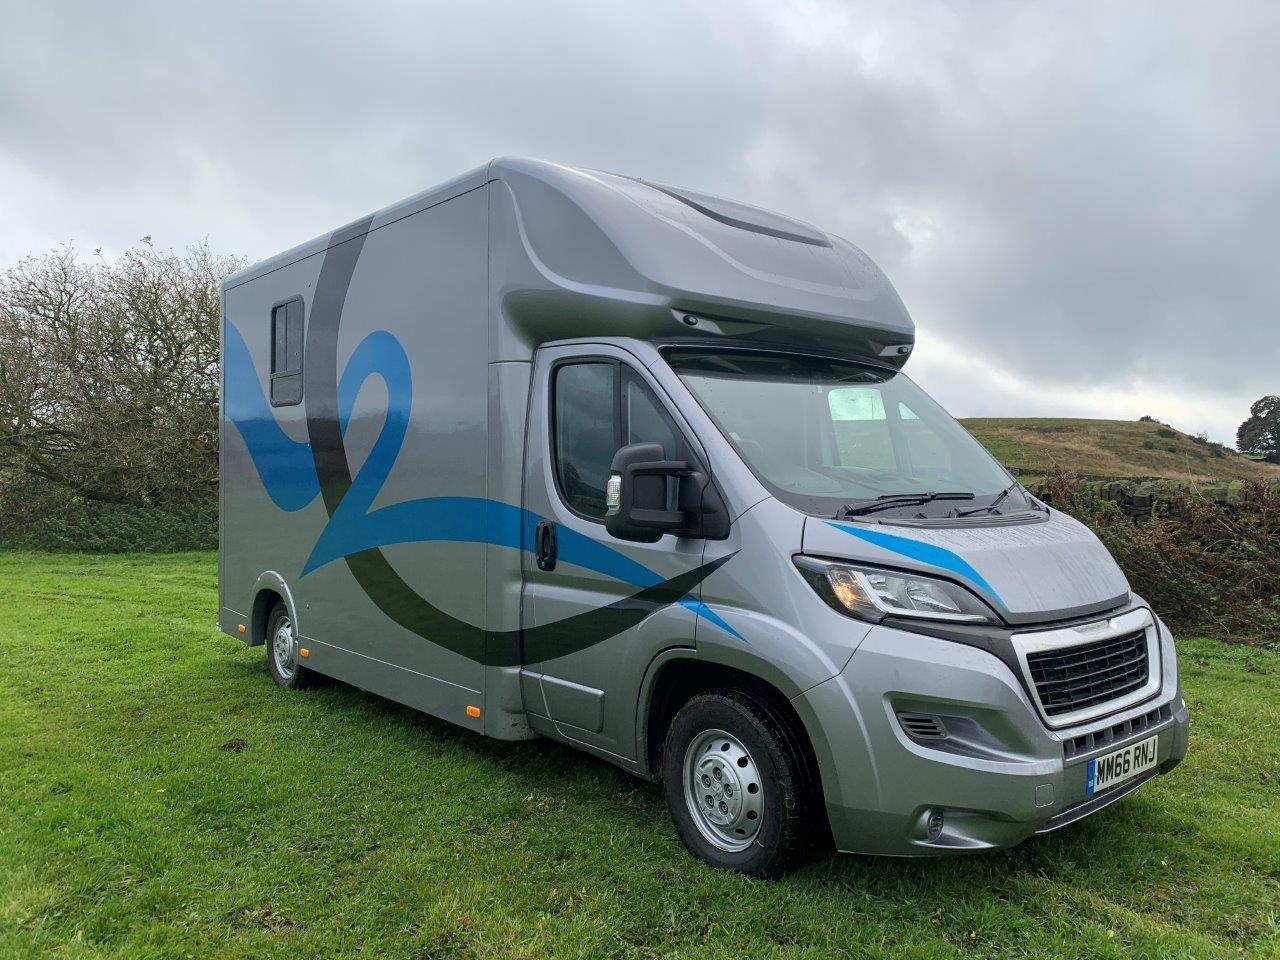 Pre-Owned Venture Horsebox 3500kg